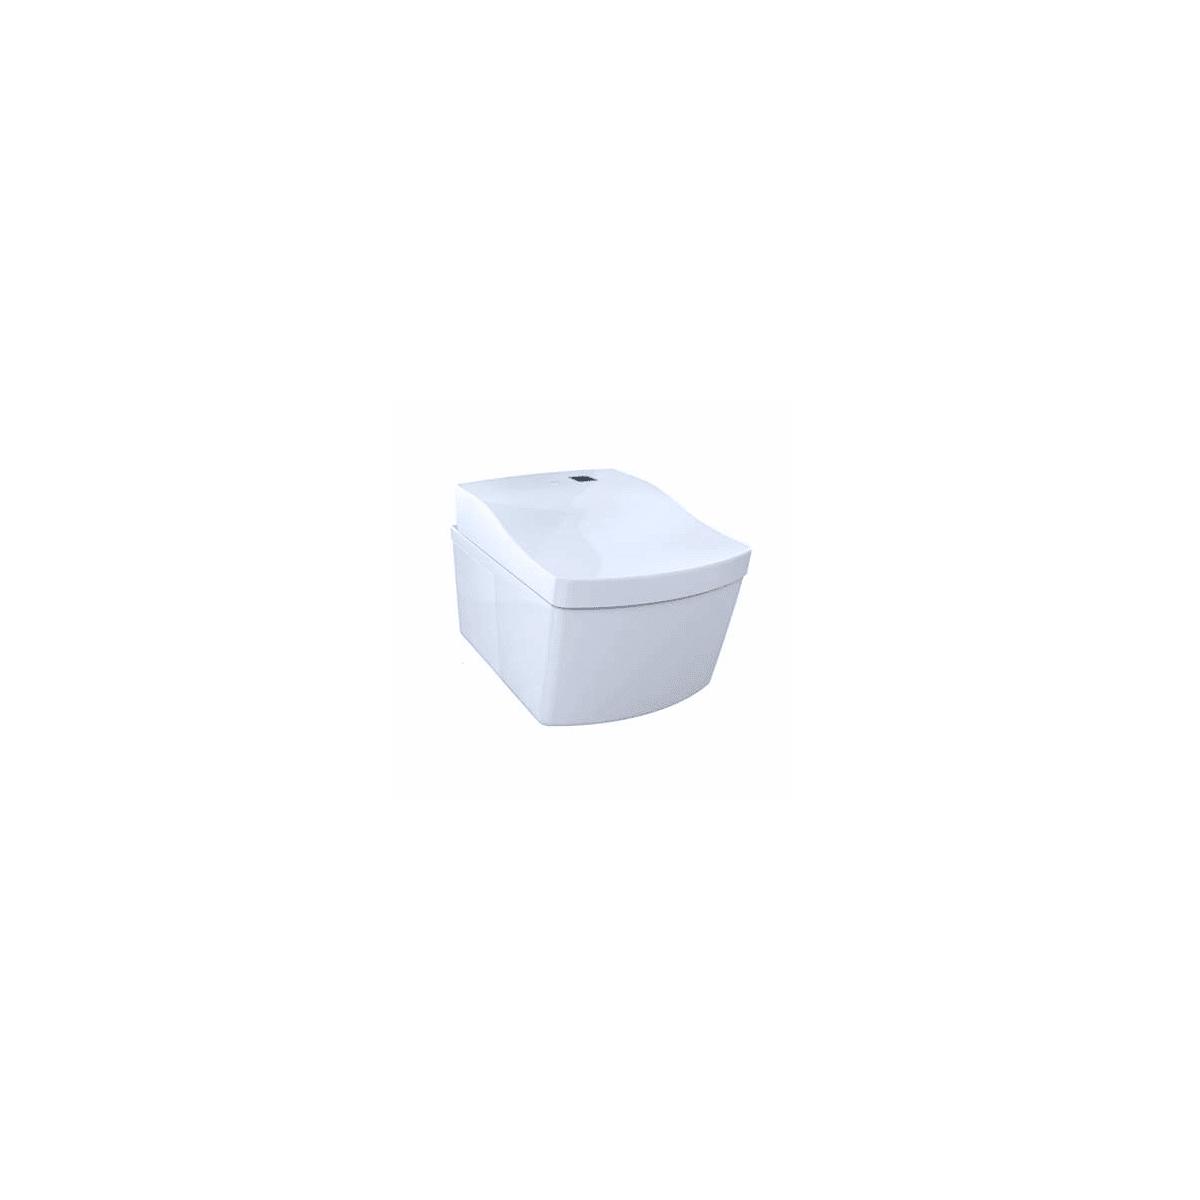 Toto CWT994CEMFG#01 Cotton Neorest Dual Flush D-Shaped Elongated ...